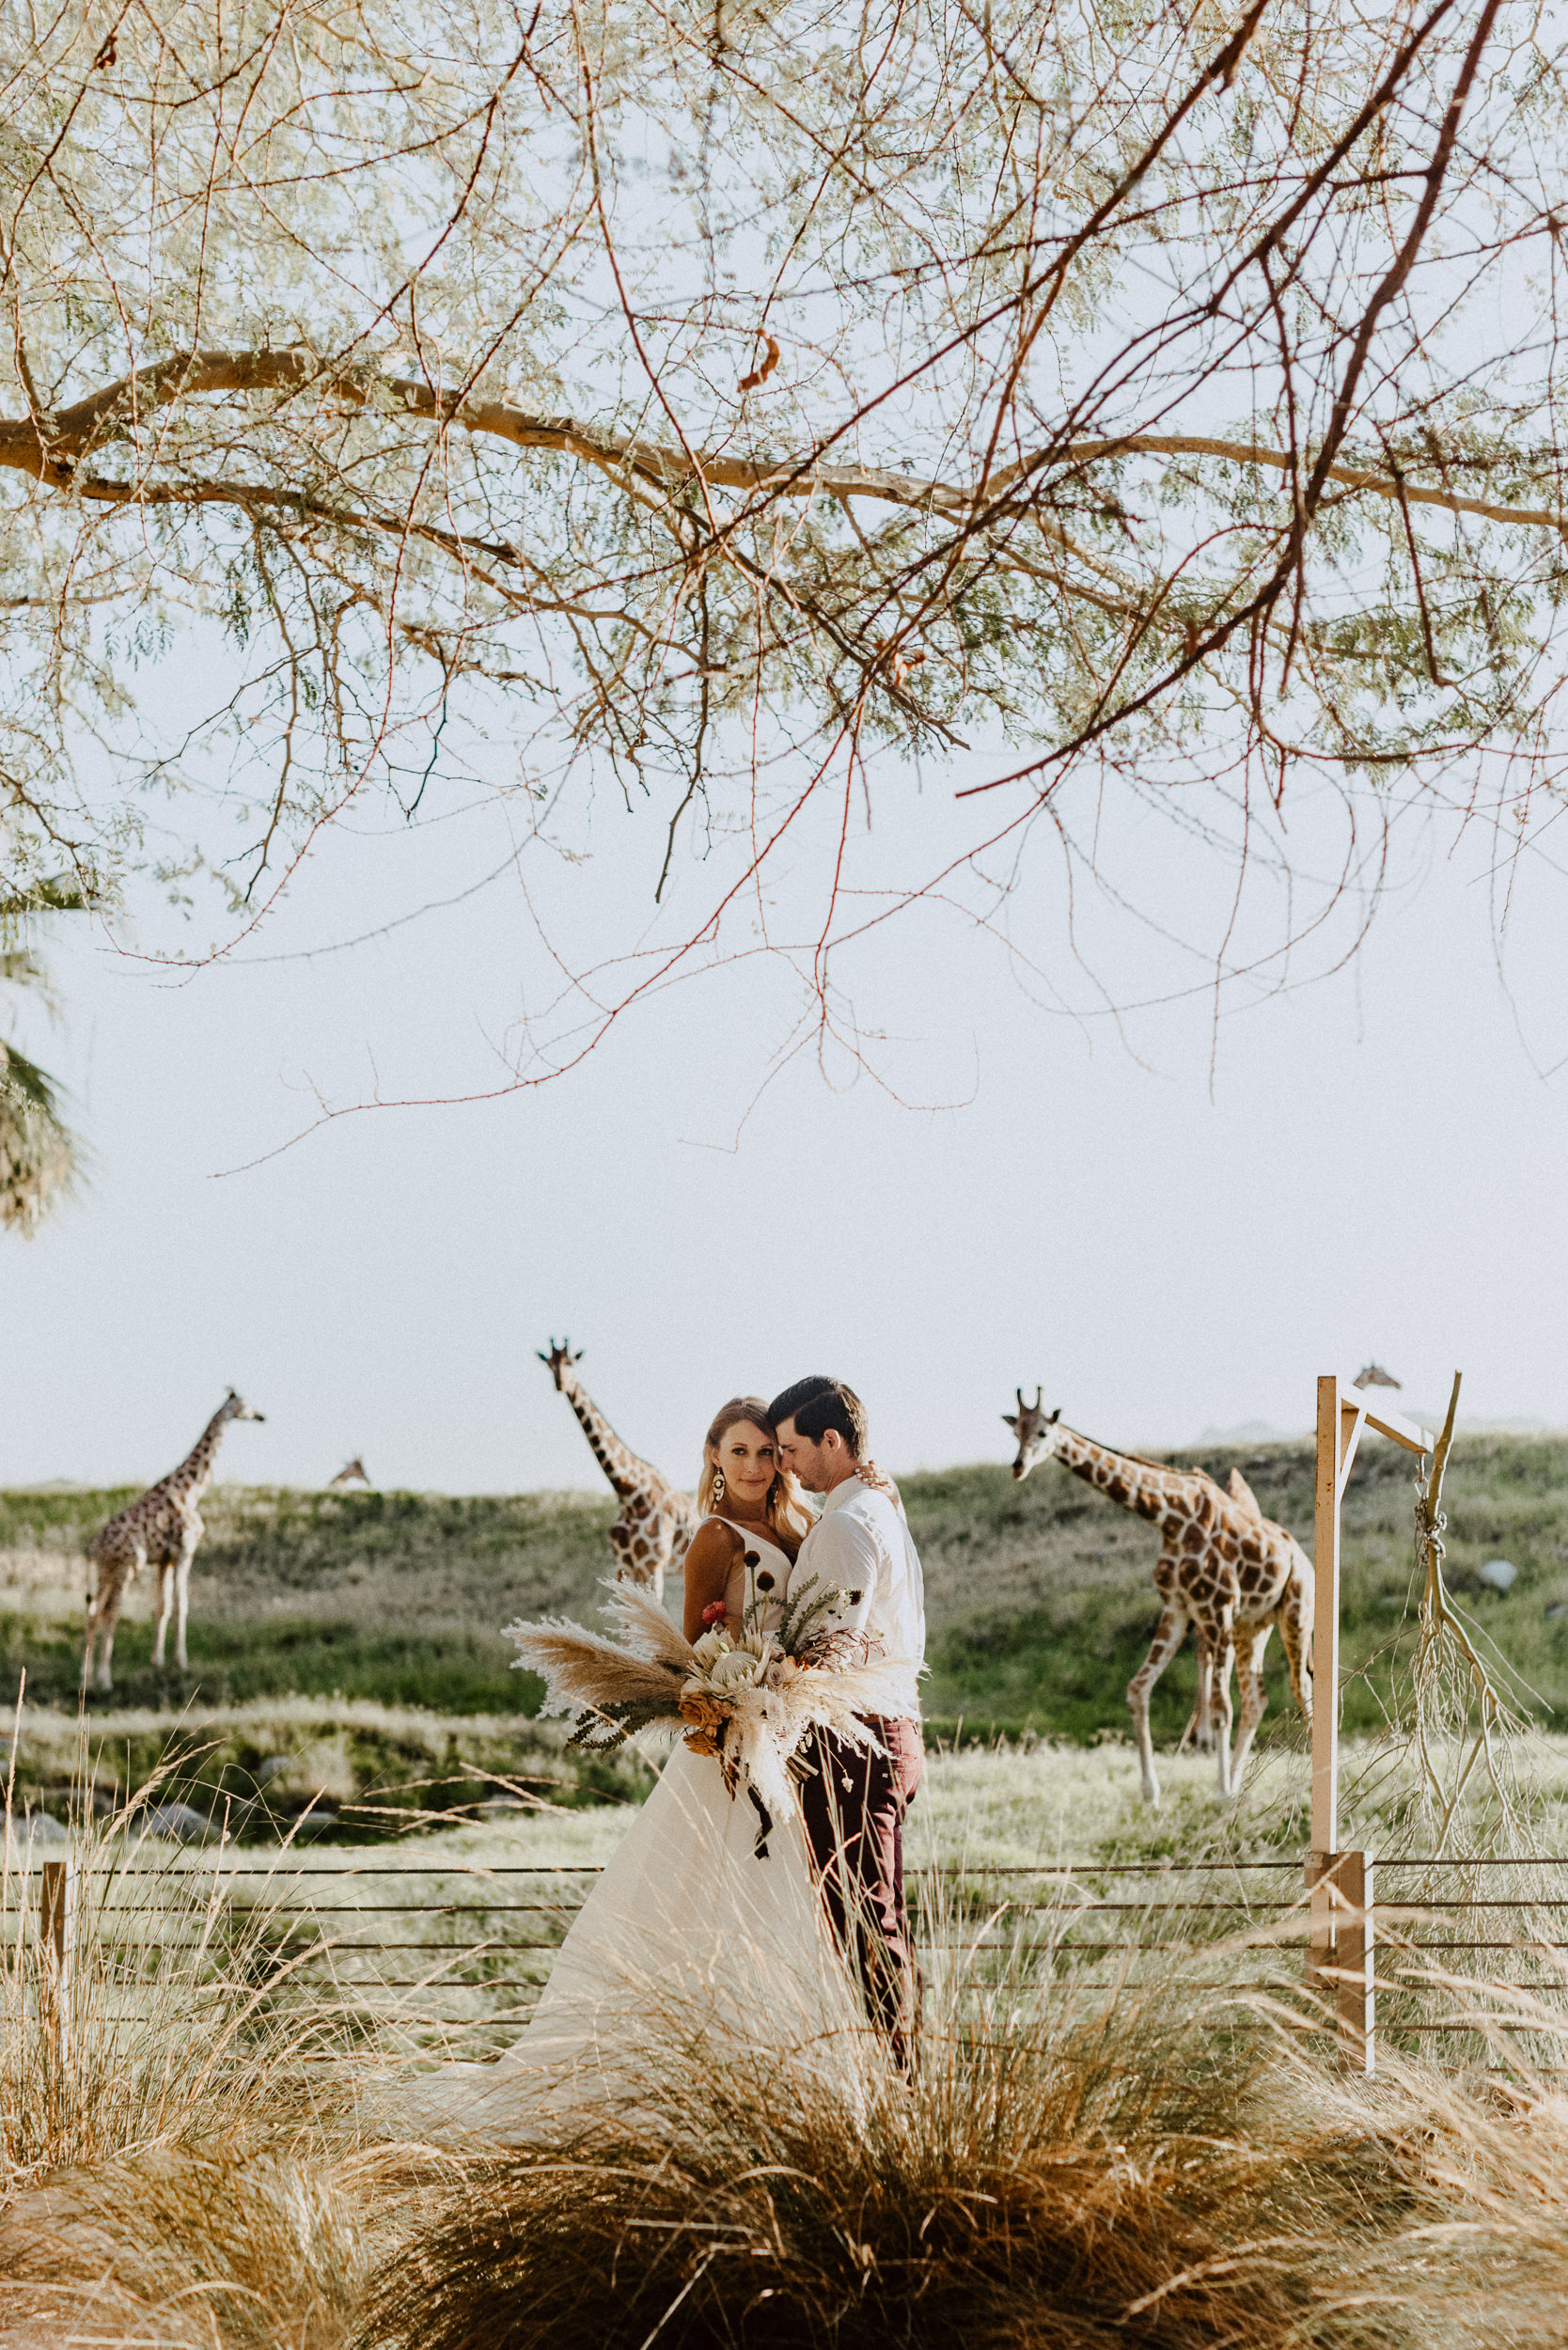 sChelsie + Chris - The Desert Shootout Wedding Romantics at The Living Desert-78.jpg